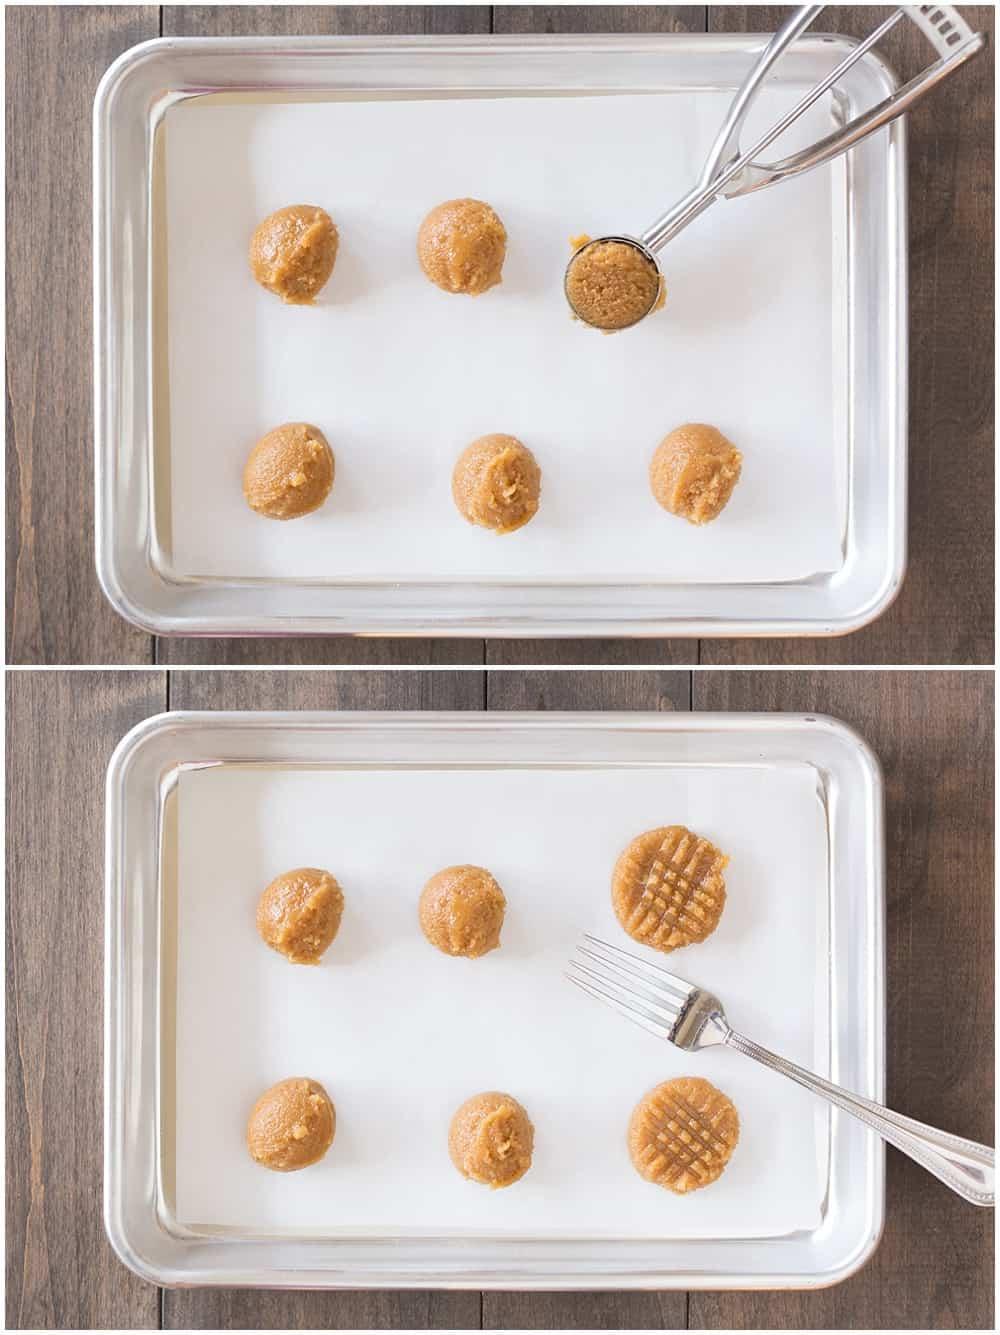 Super simple homemade 3 ingredient peanut butter cookies!